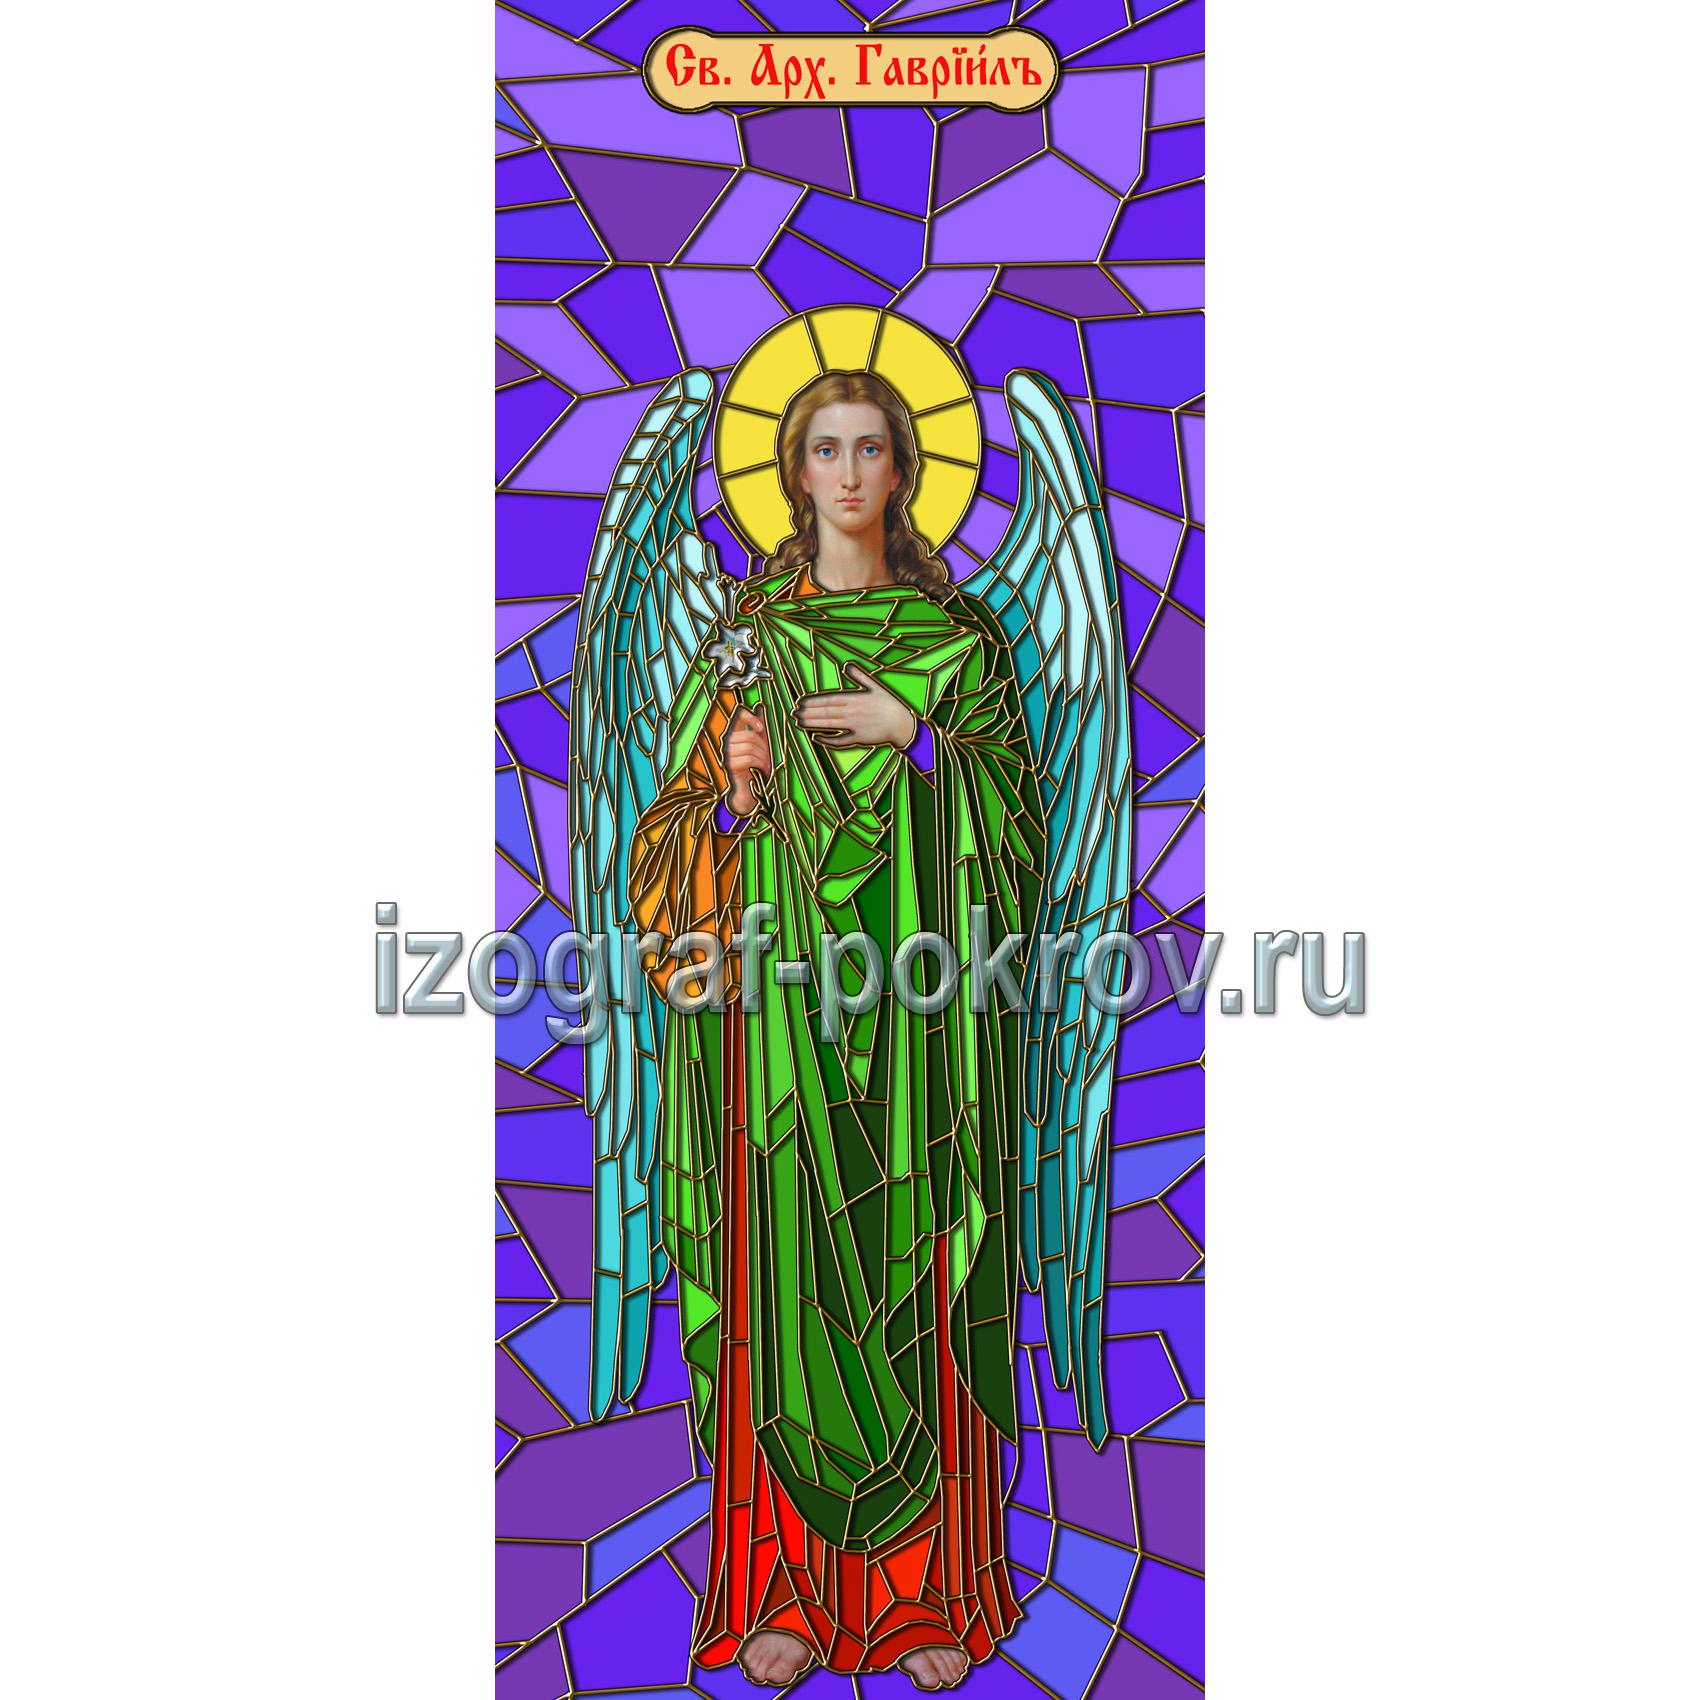 Арх Гавриил макет витража на окна для храма вариант 2